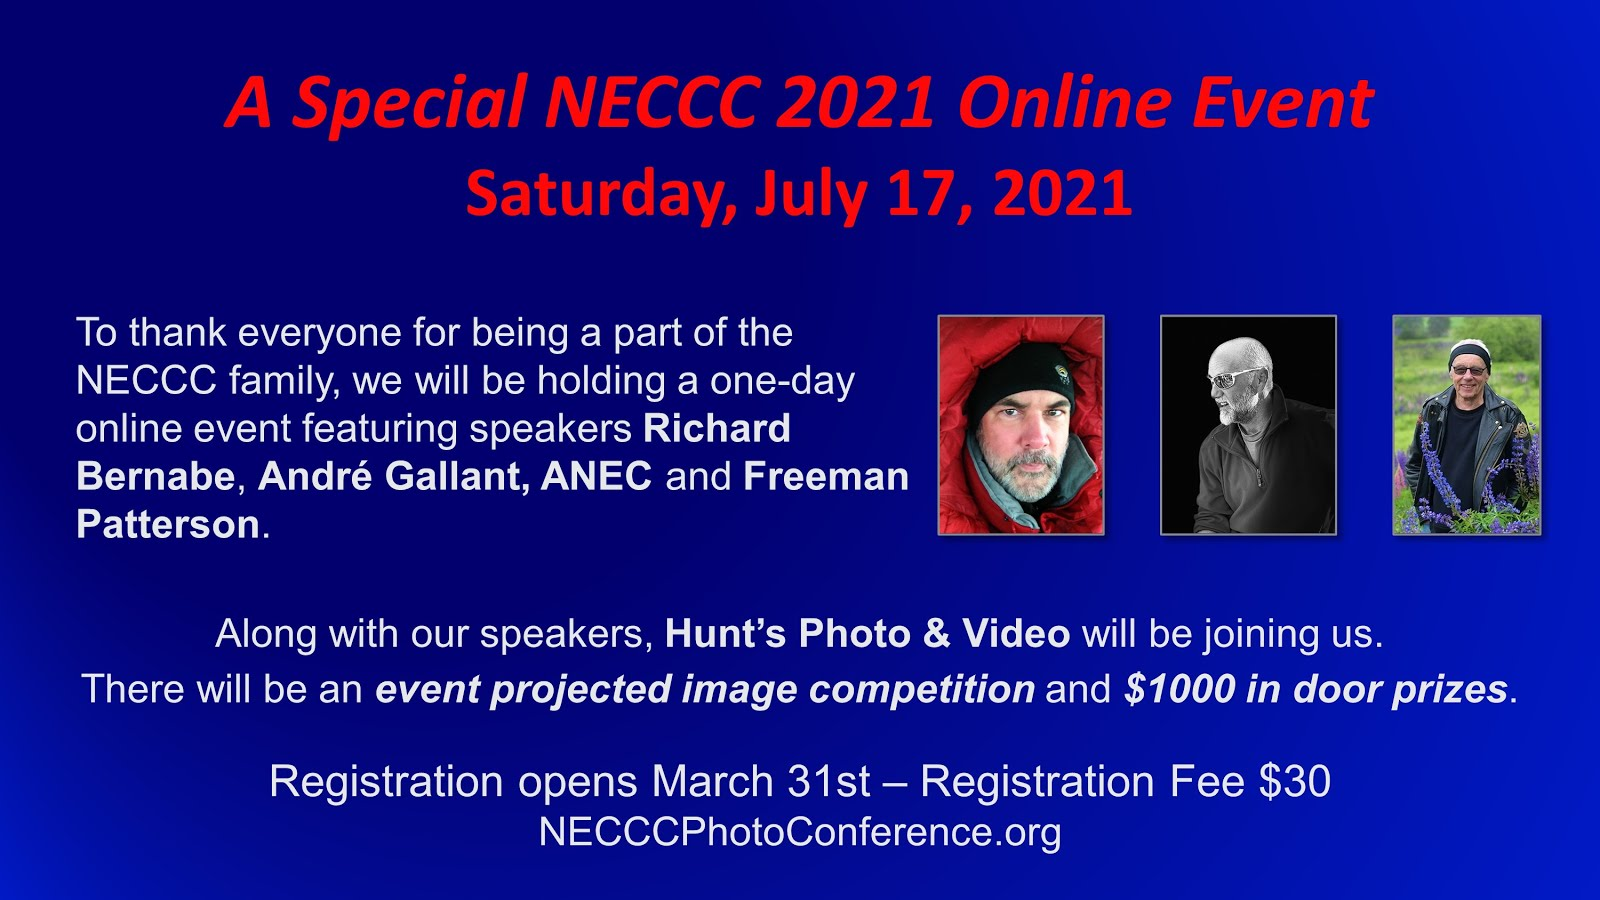 2021 Online Event